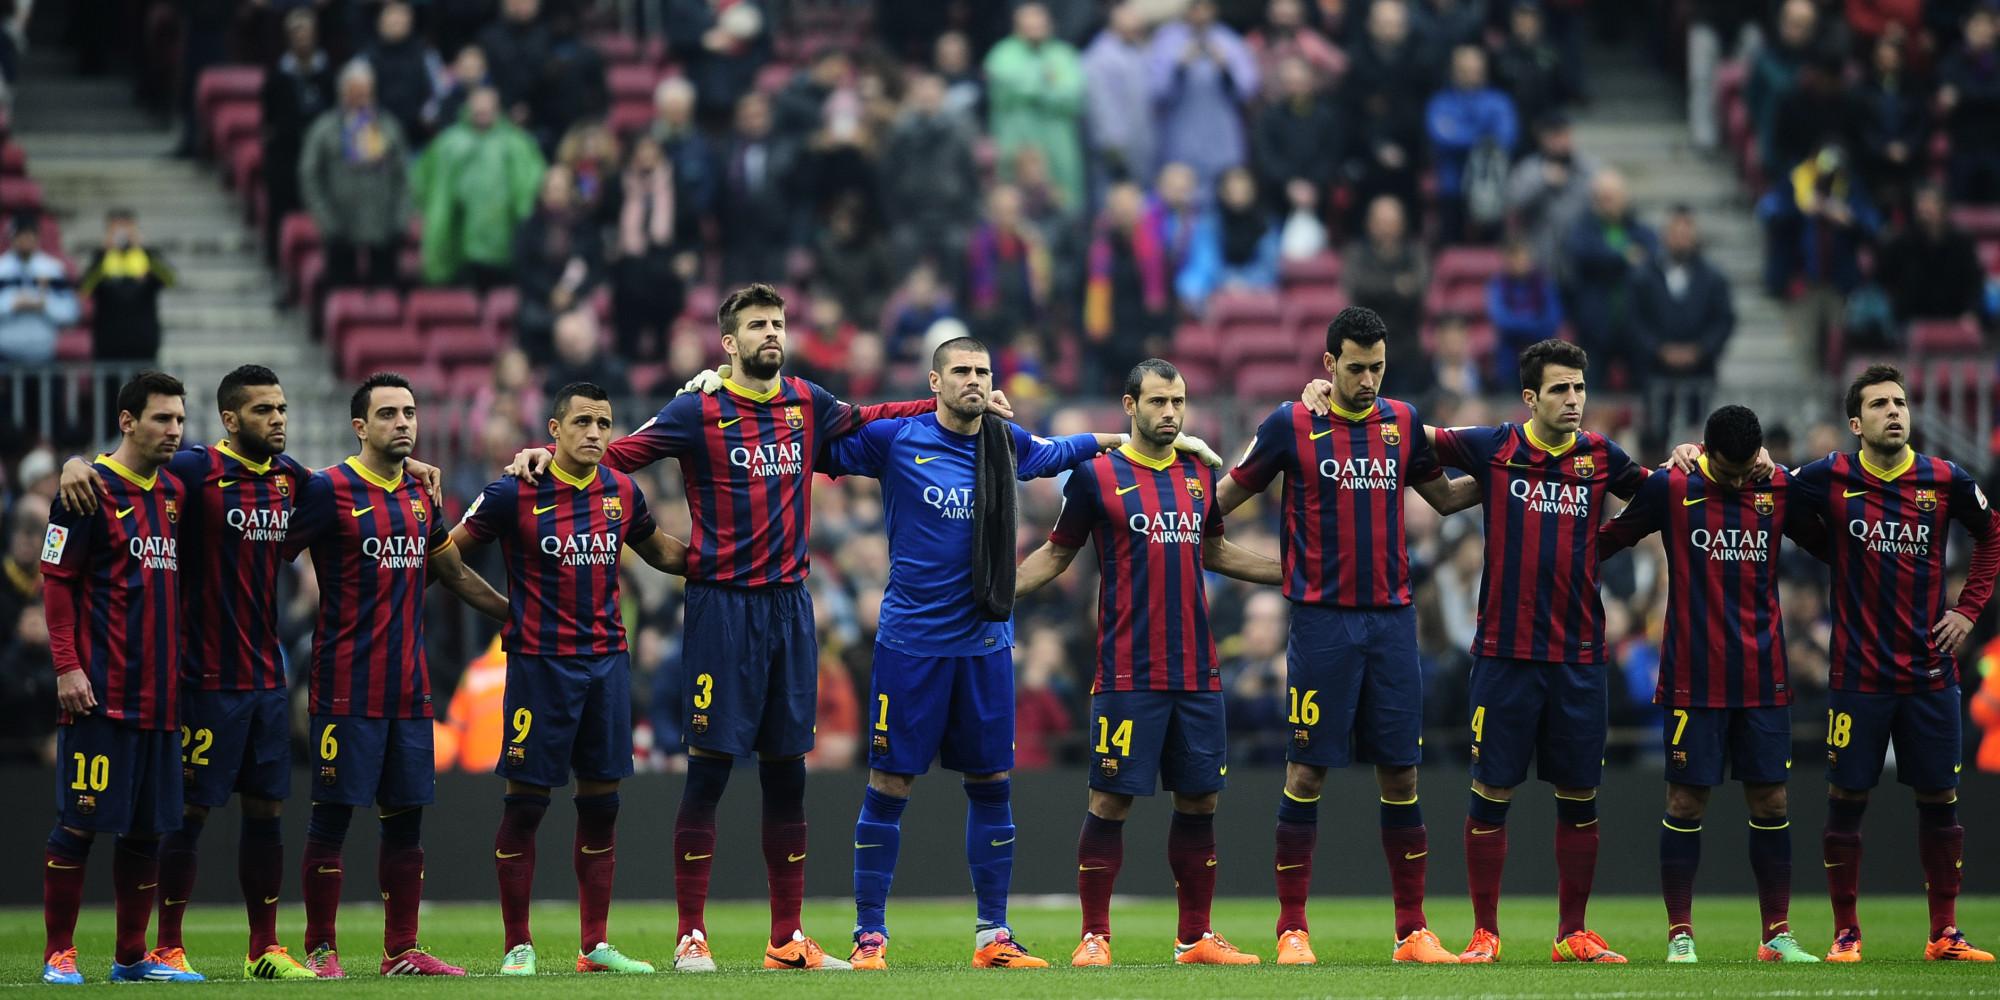 FC Barcelona Wallpapers 2015 2000x1000